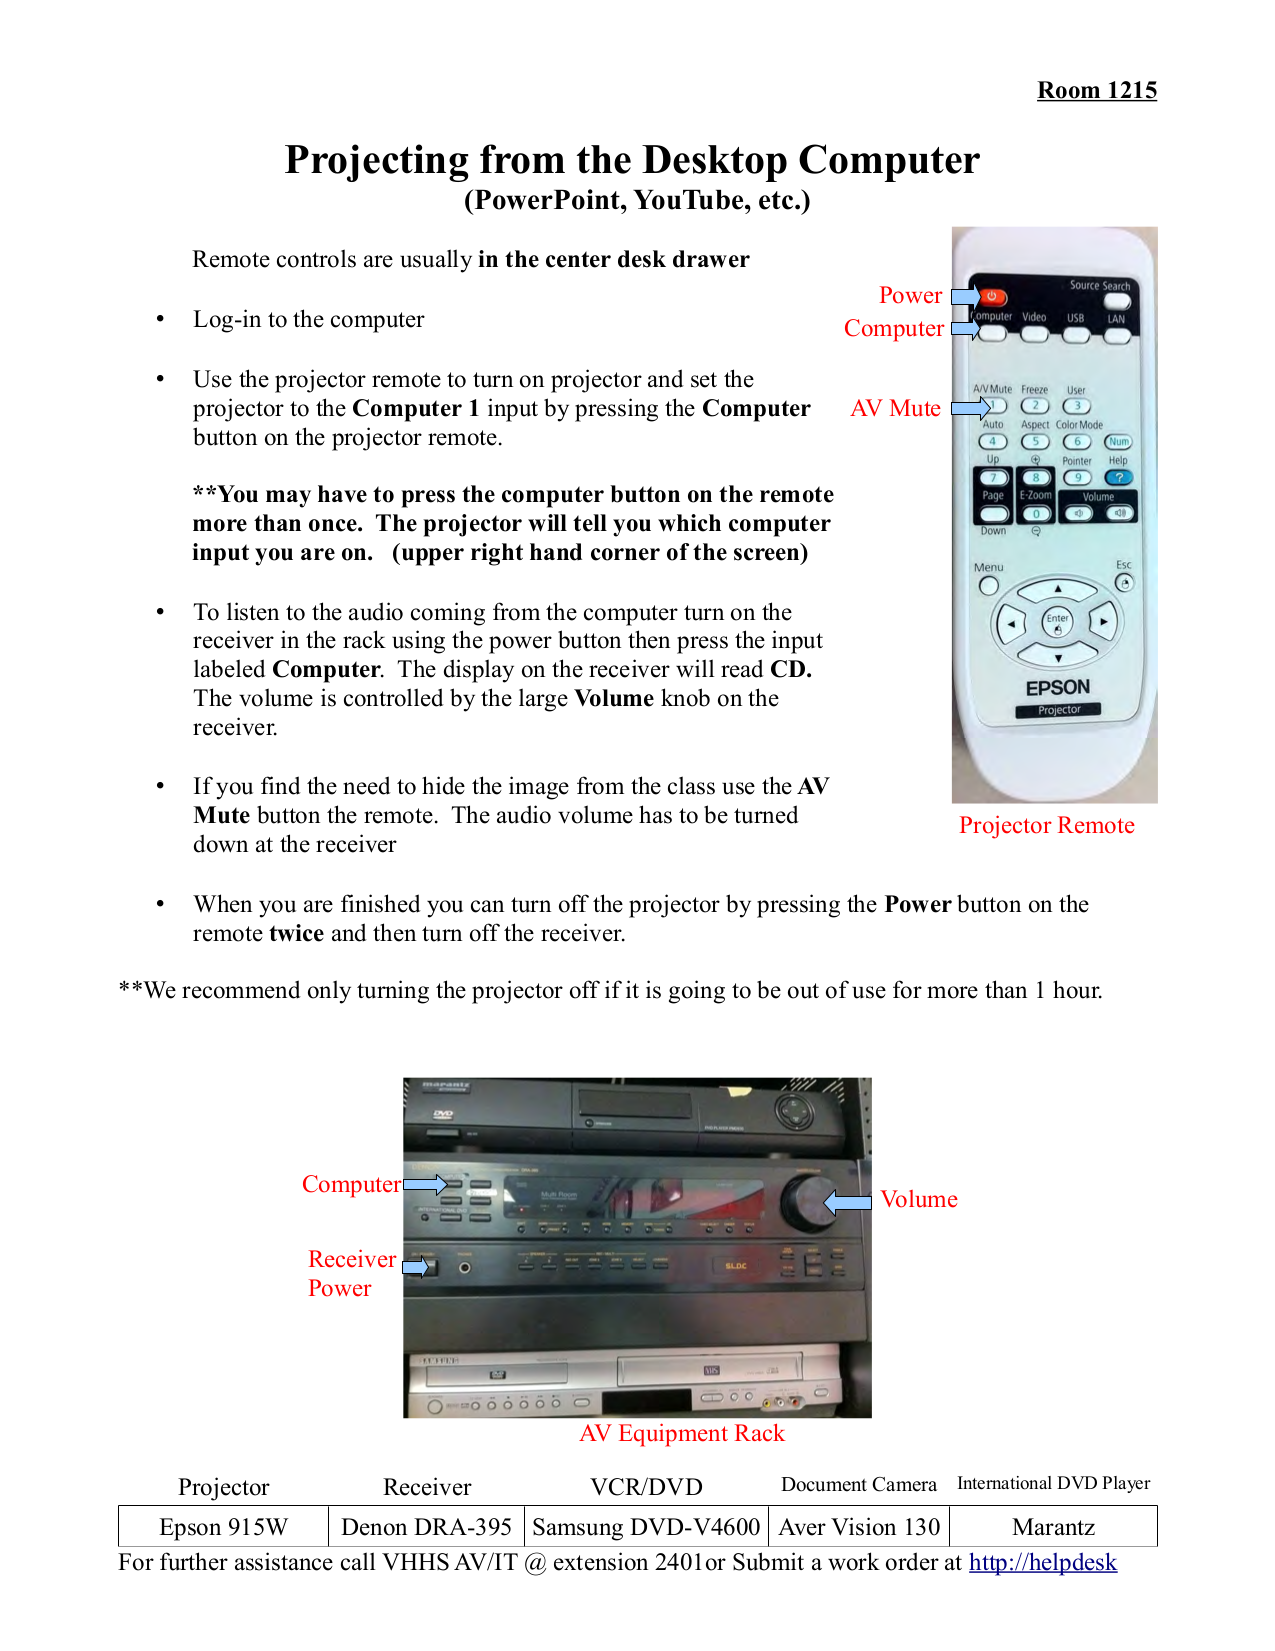 samsung dvd v4600c manual how to and user guide instructions u2022 rh taxibermuda co Verizon Samsung Flip Phone Manual Samsung User Manual Guide